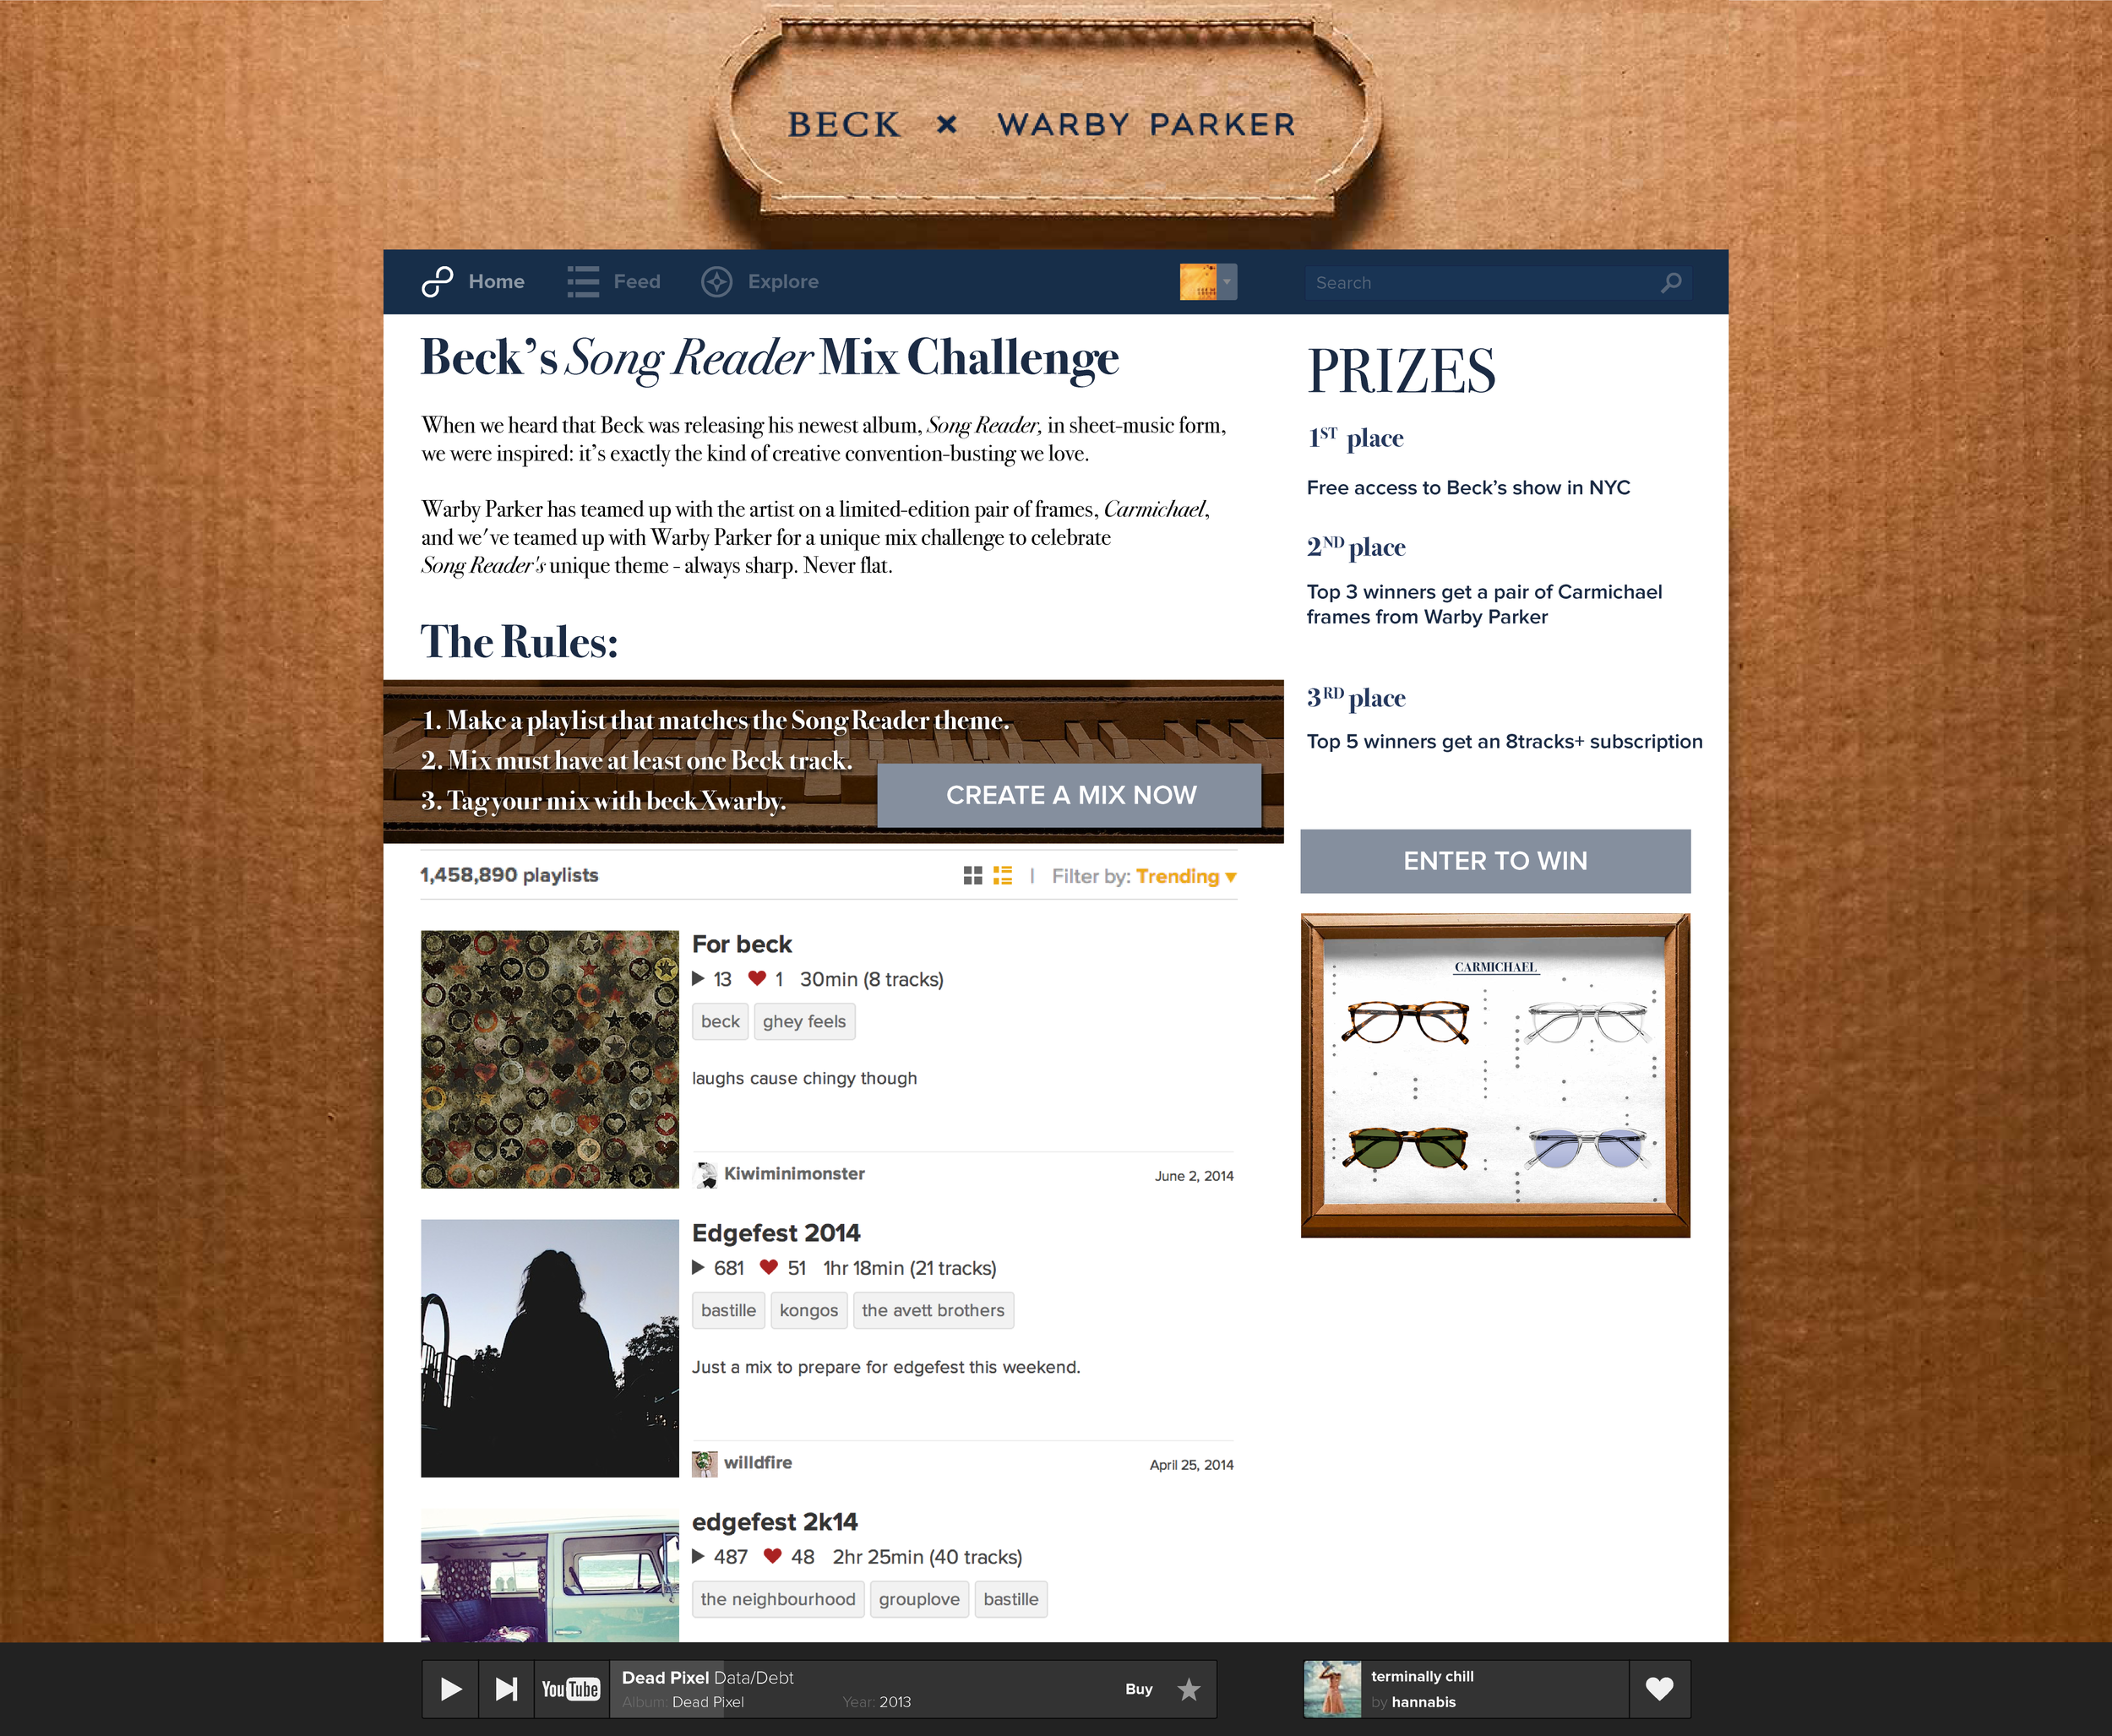 8tracks x Beck x Warby Parker Concept   brand/identity, web design, vis design